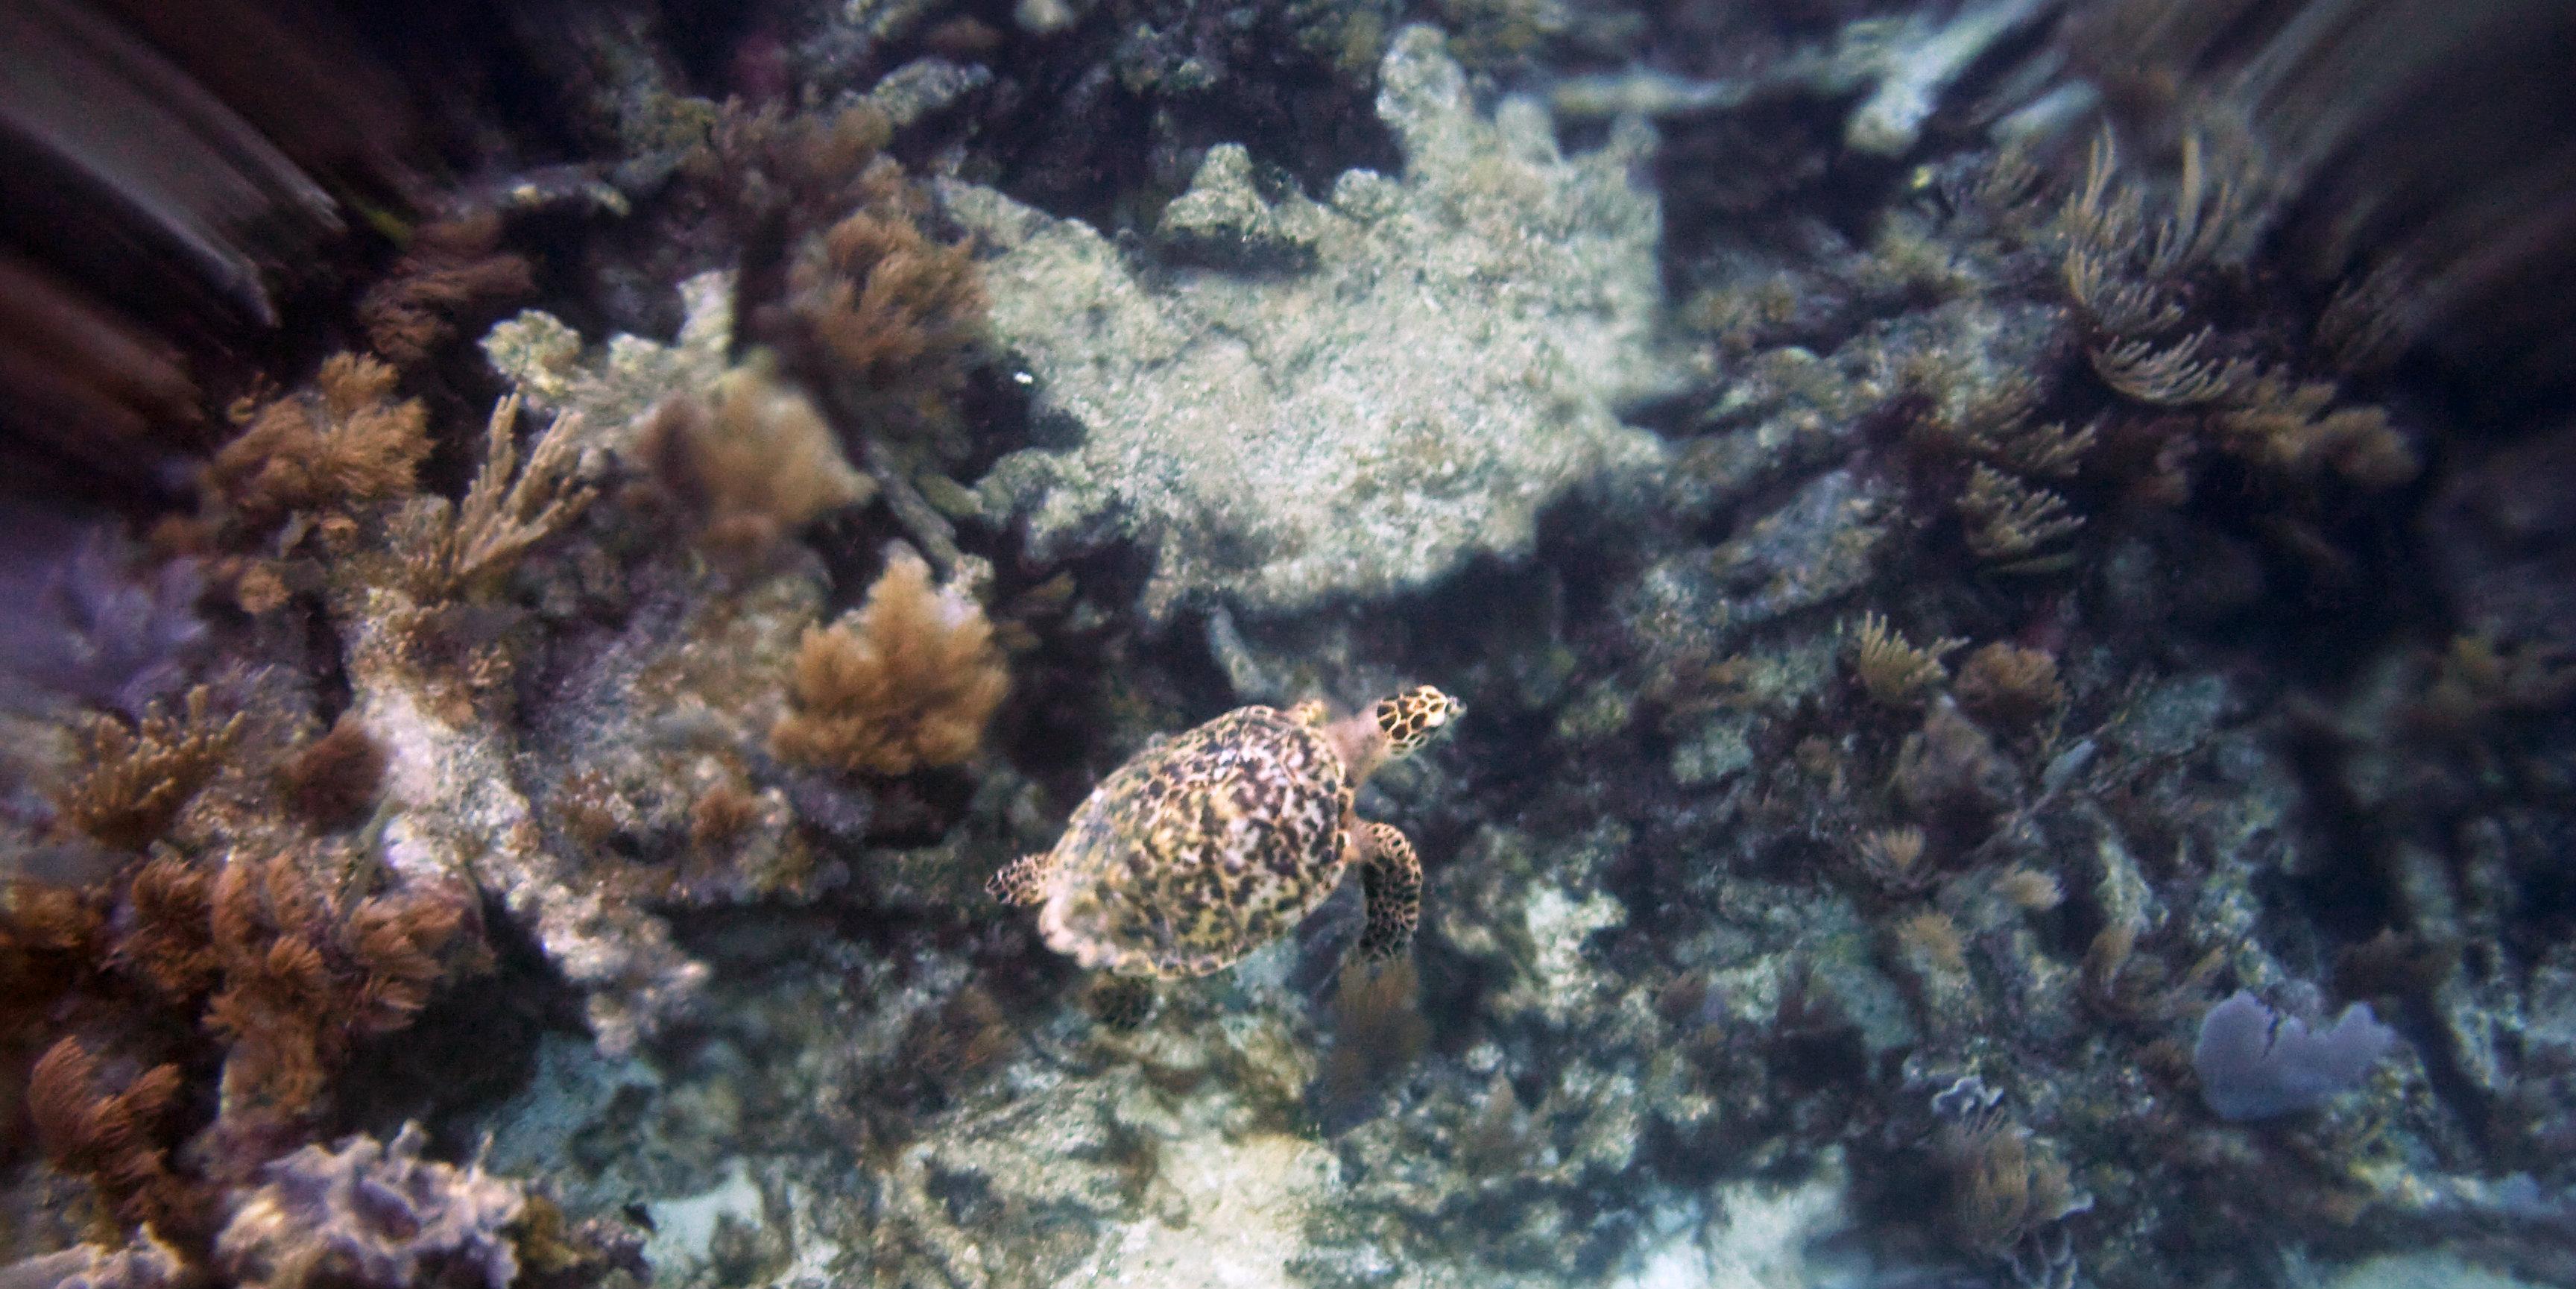 Volunteering in marine conservation